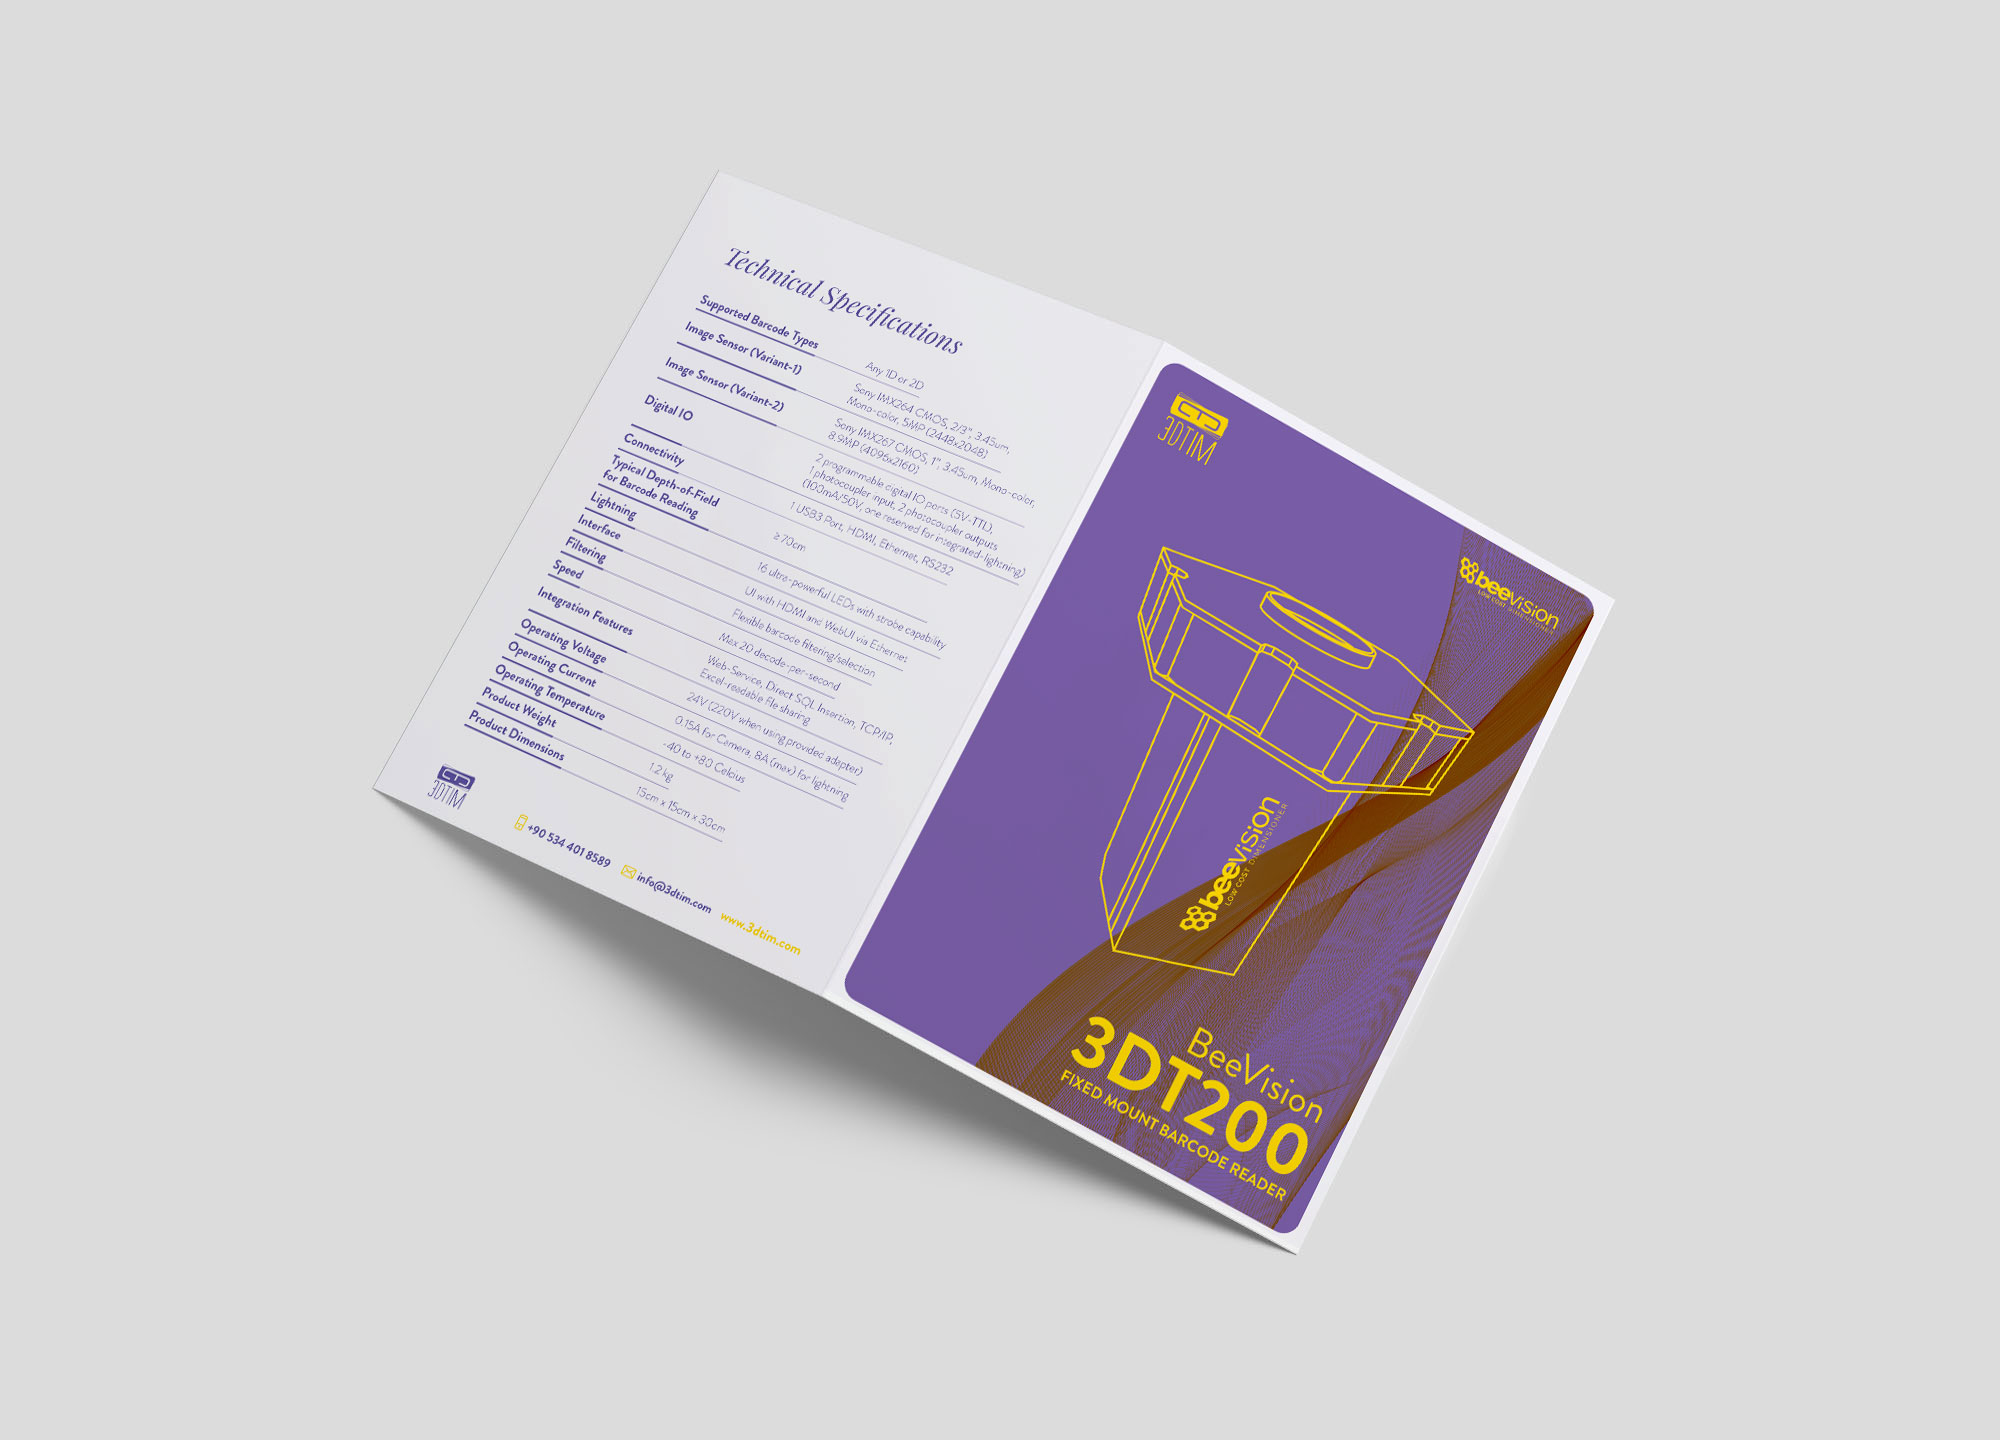 3DTIM | Beevision